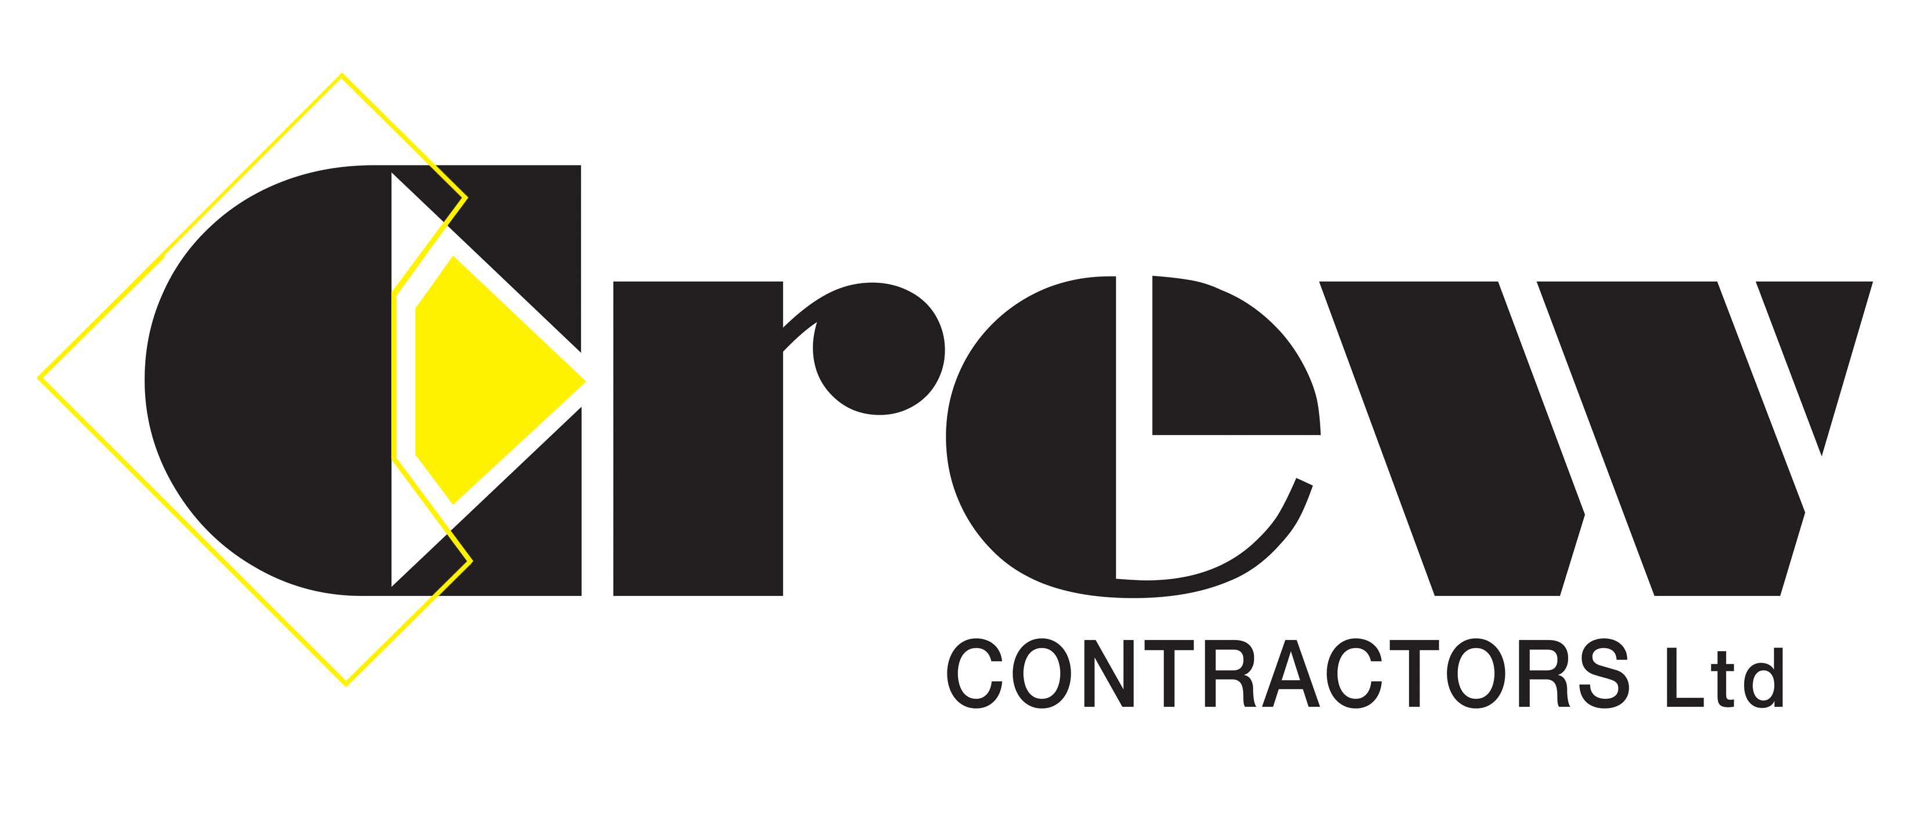 Crew Contractors Ltd